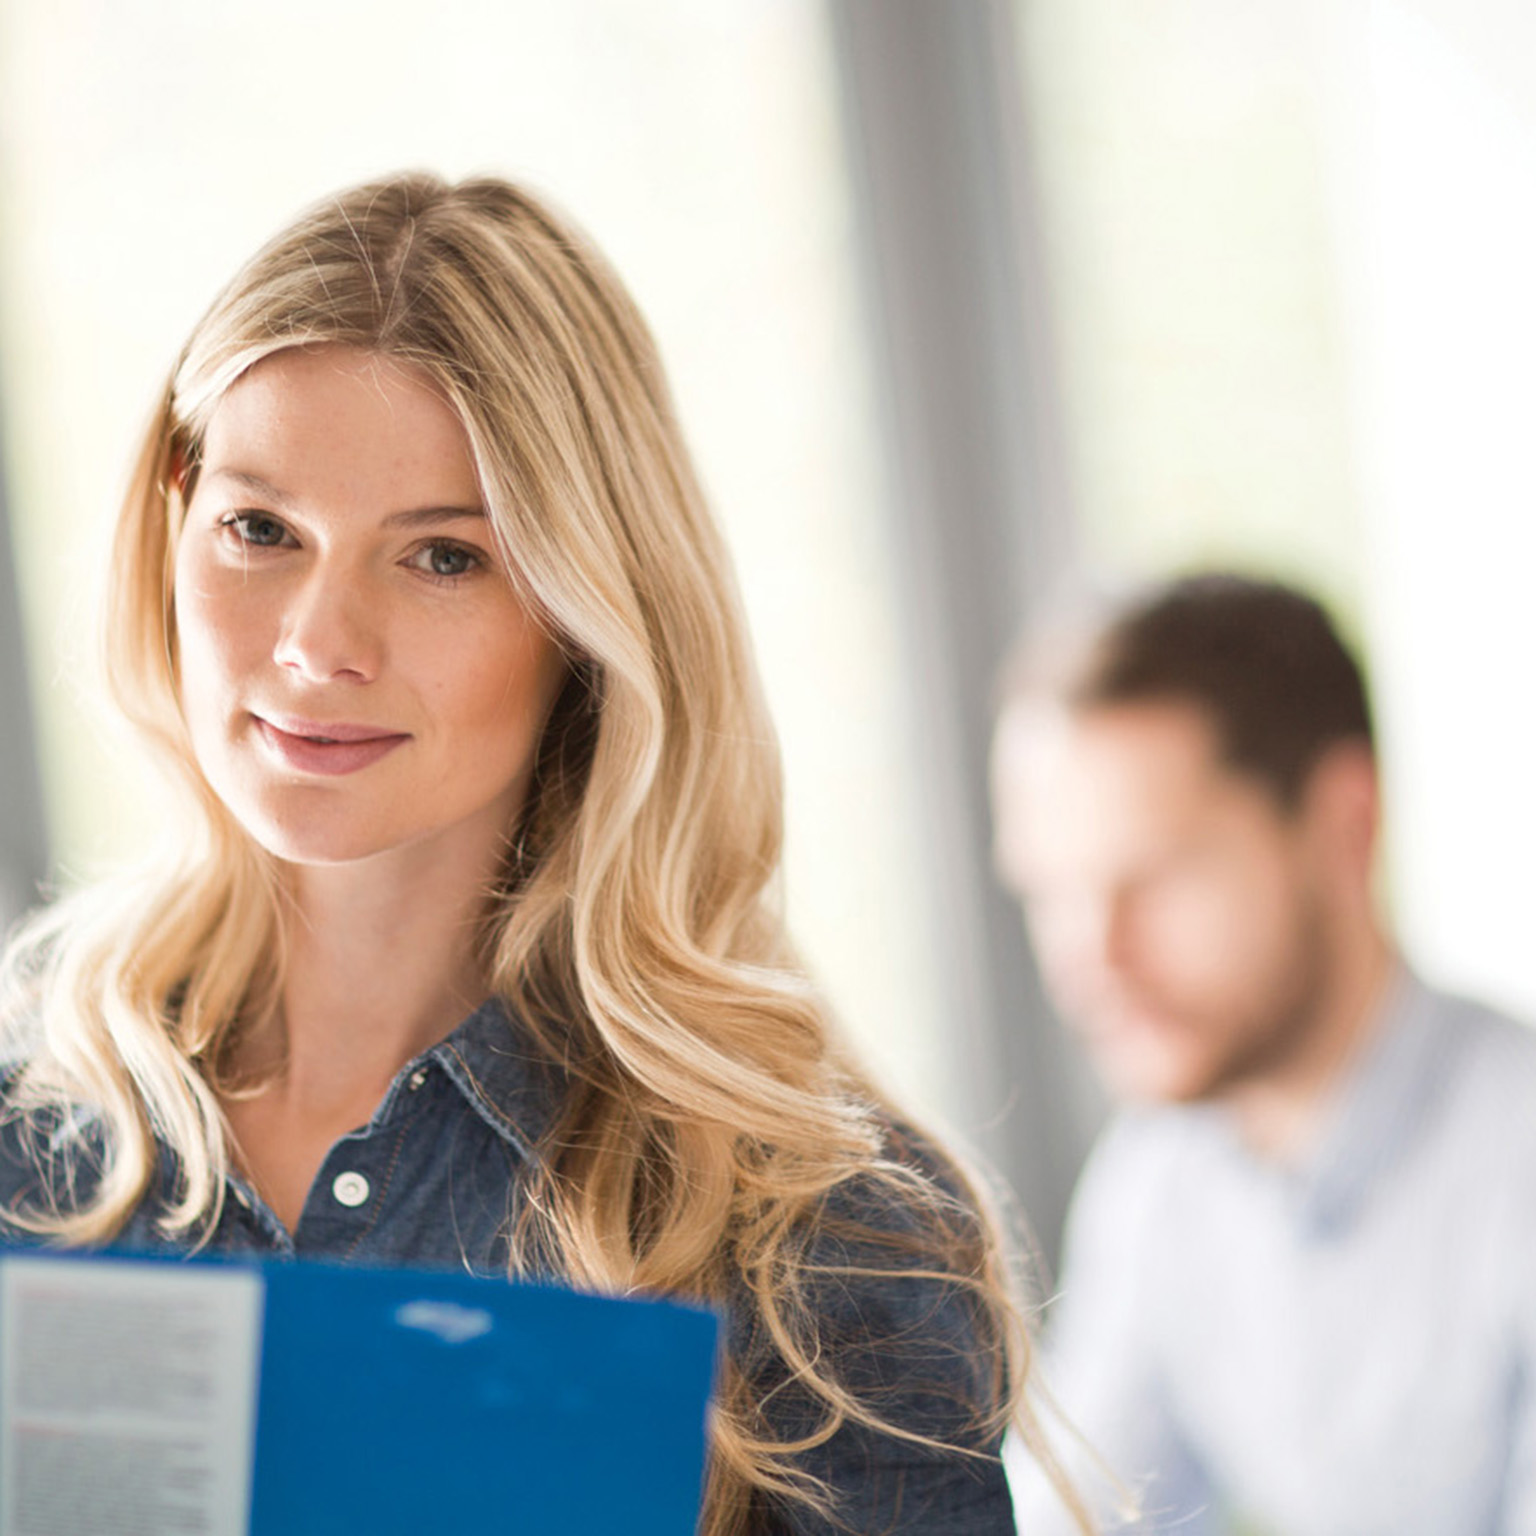 Forretningskvinne på kontoret